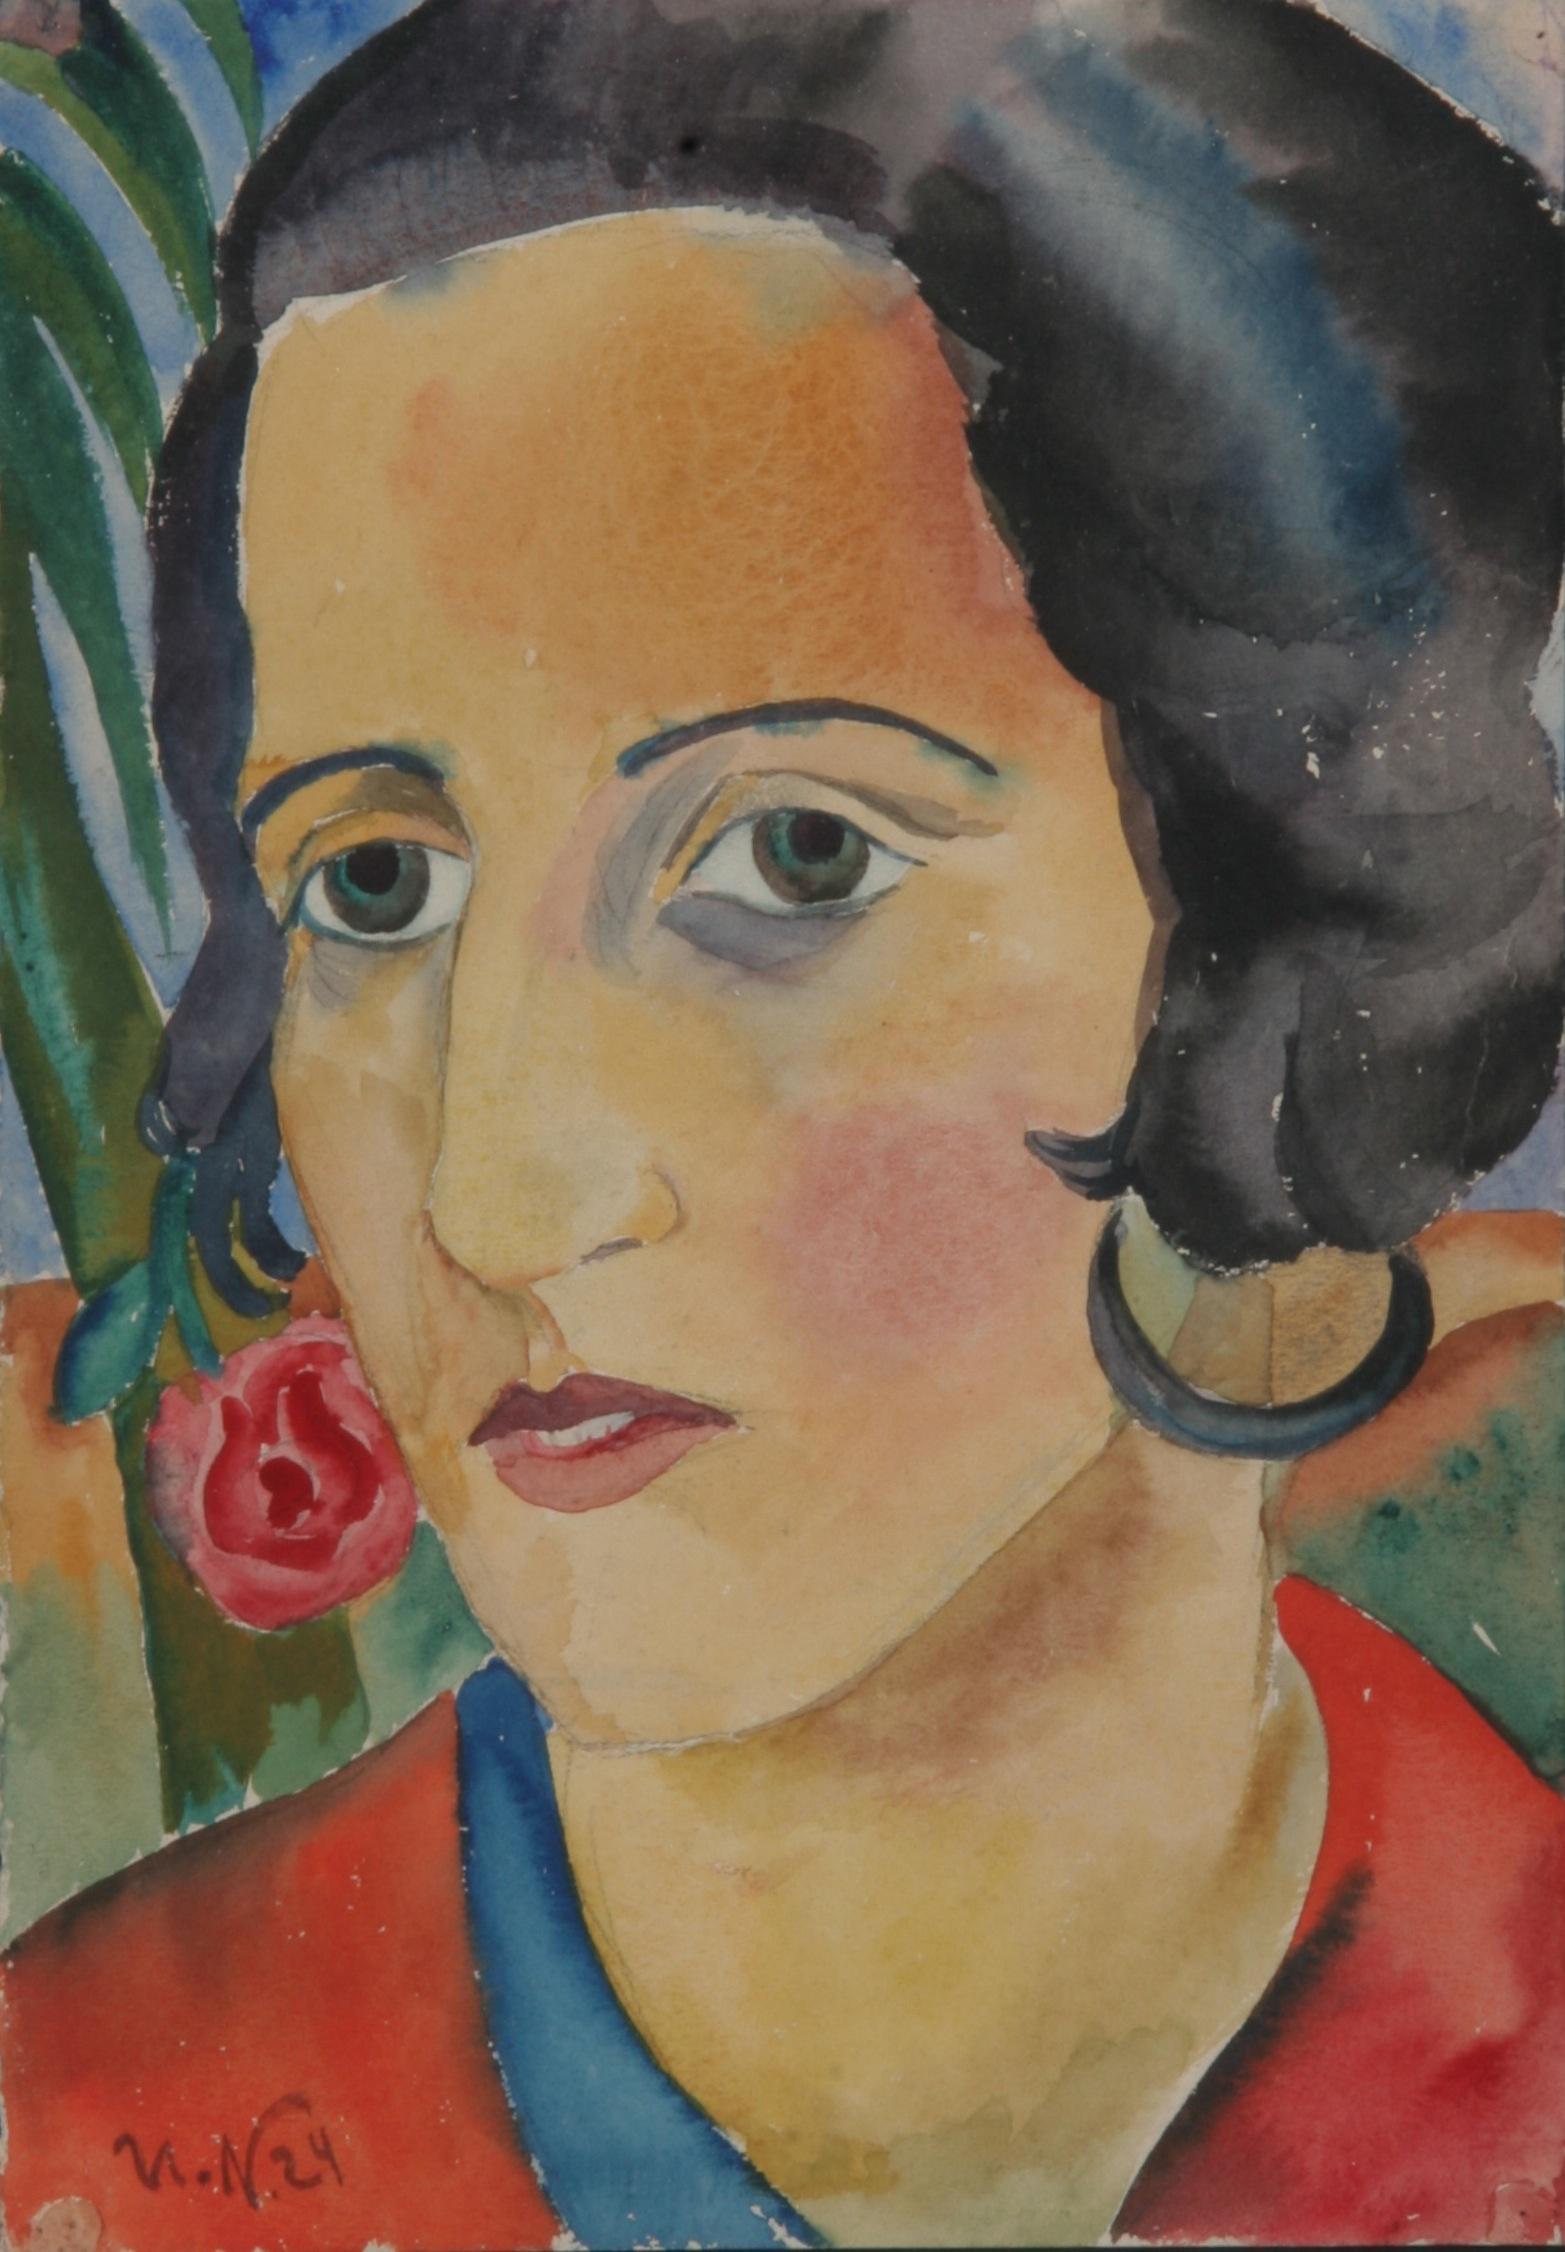 Frauenportrait mit Ohrschmuck, 1924, Aquarell, 25,5 x 38 cm